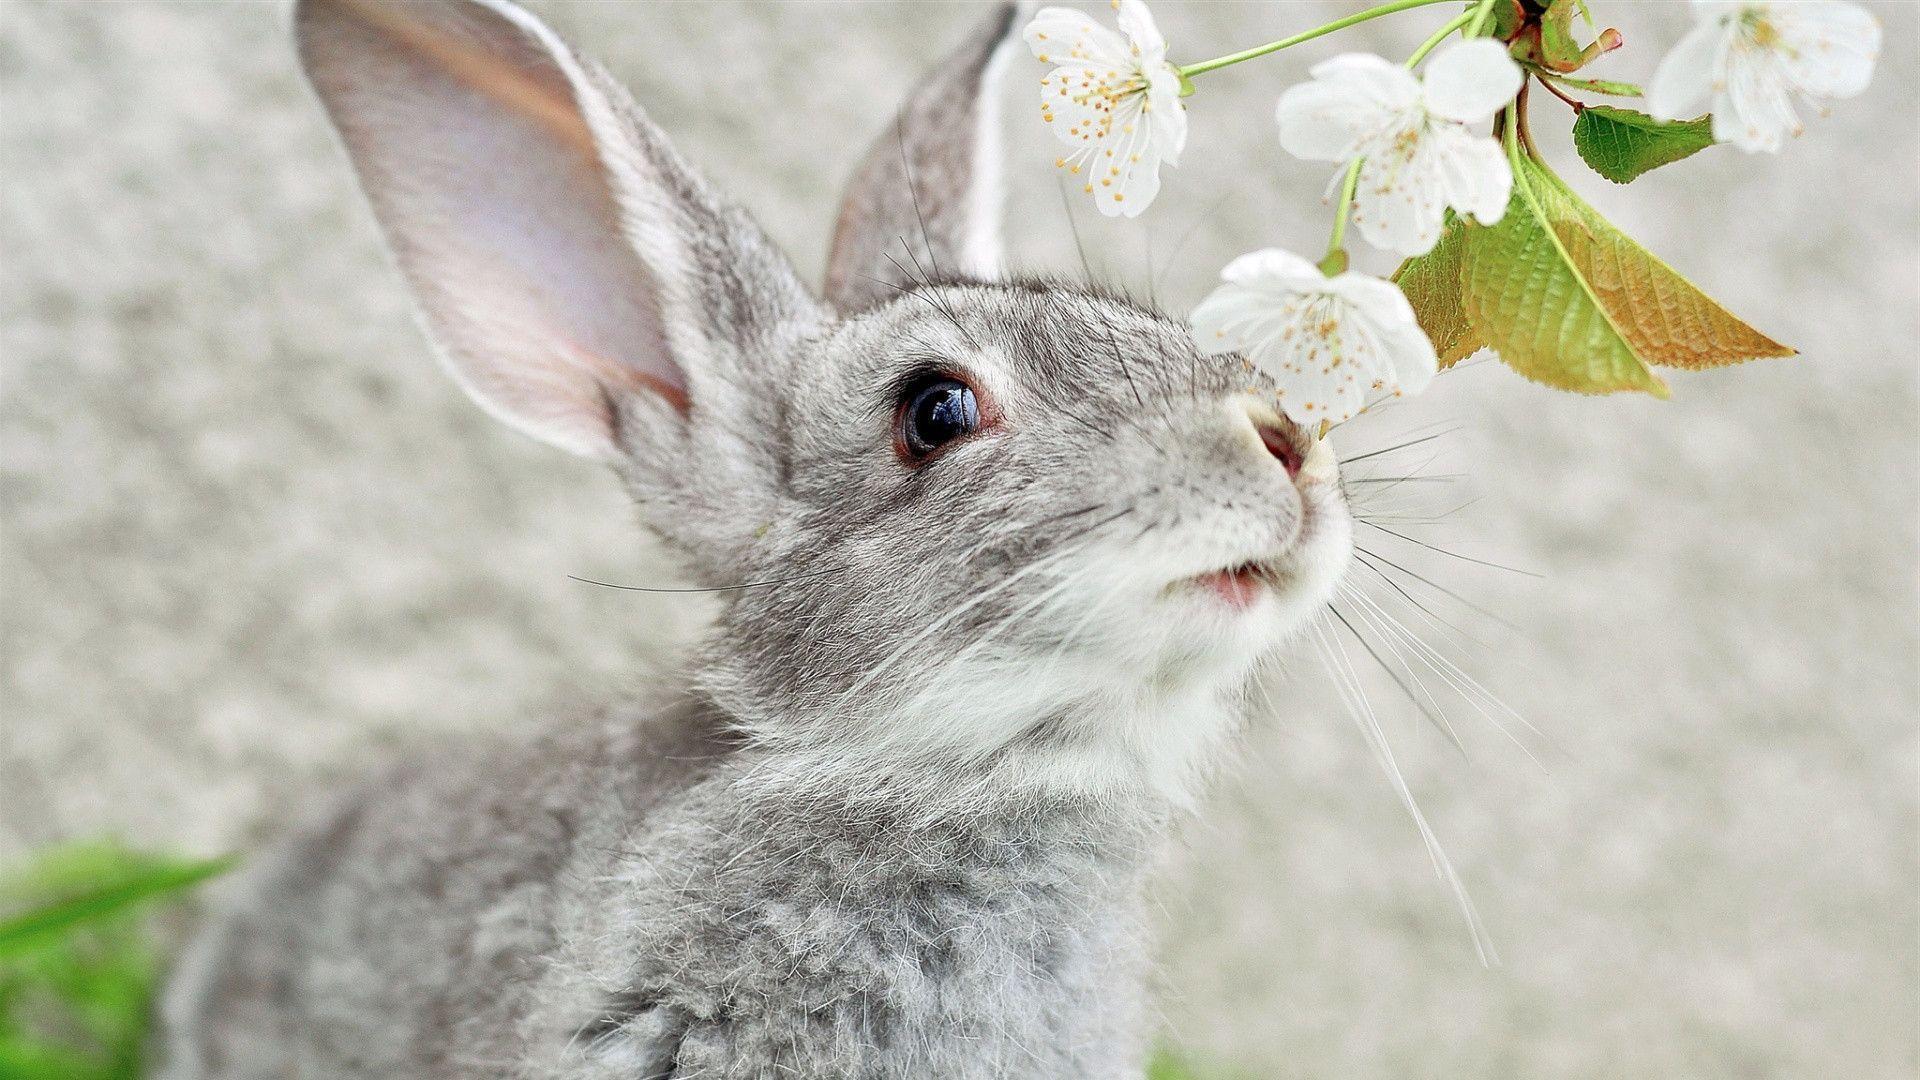 bunny computer wallpapers - photo #11